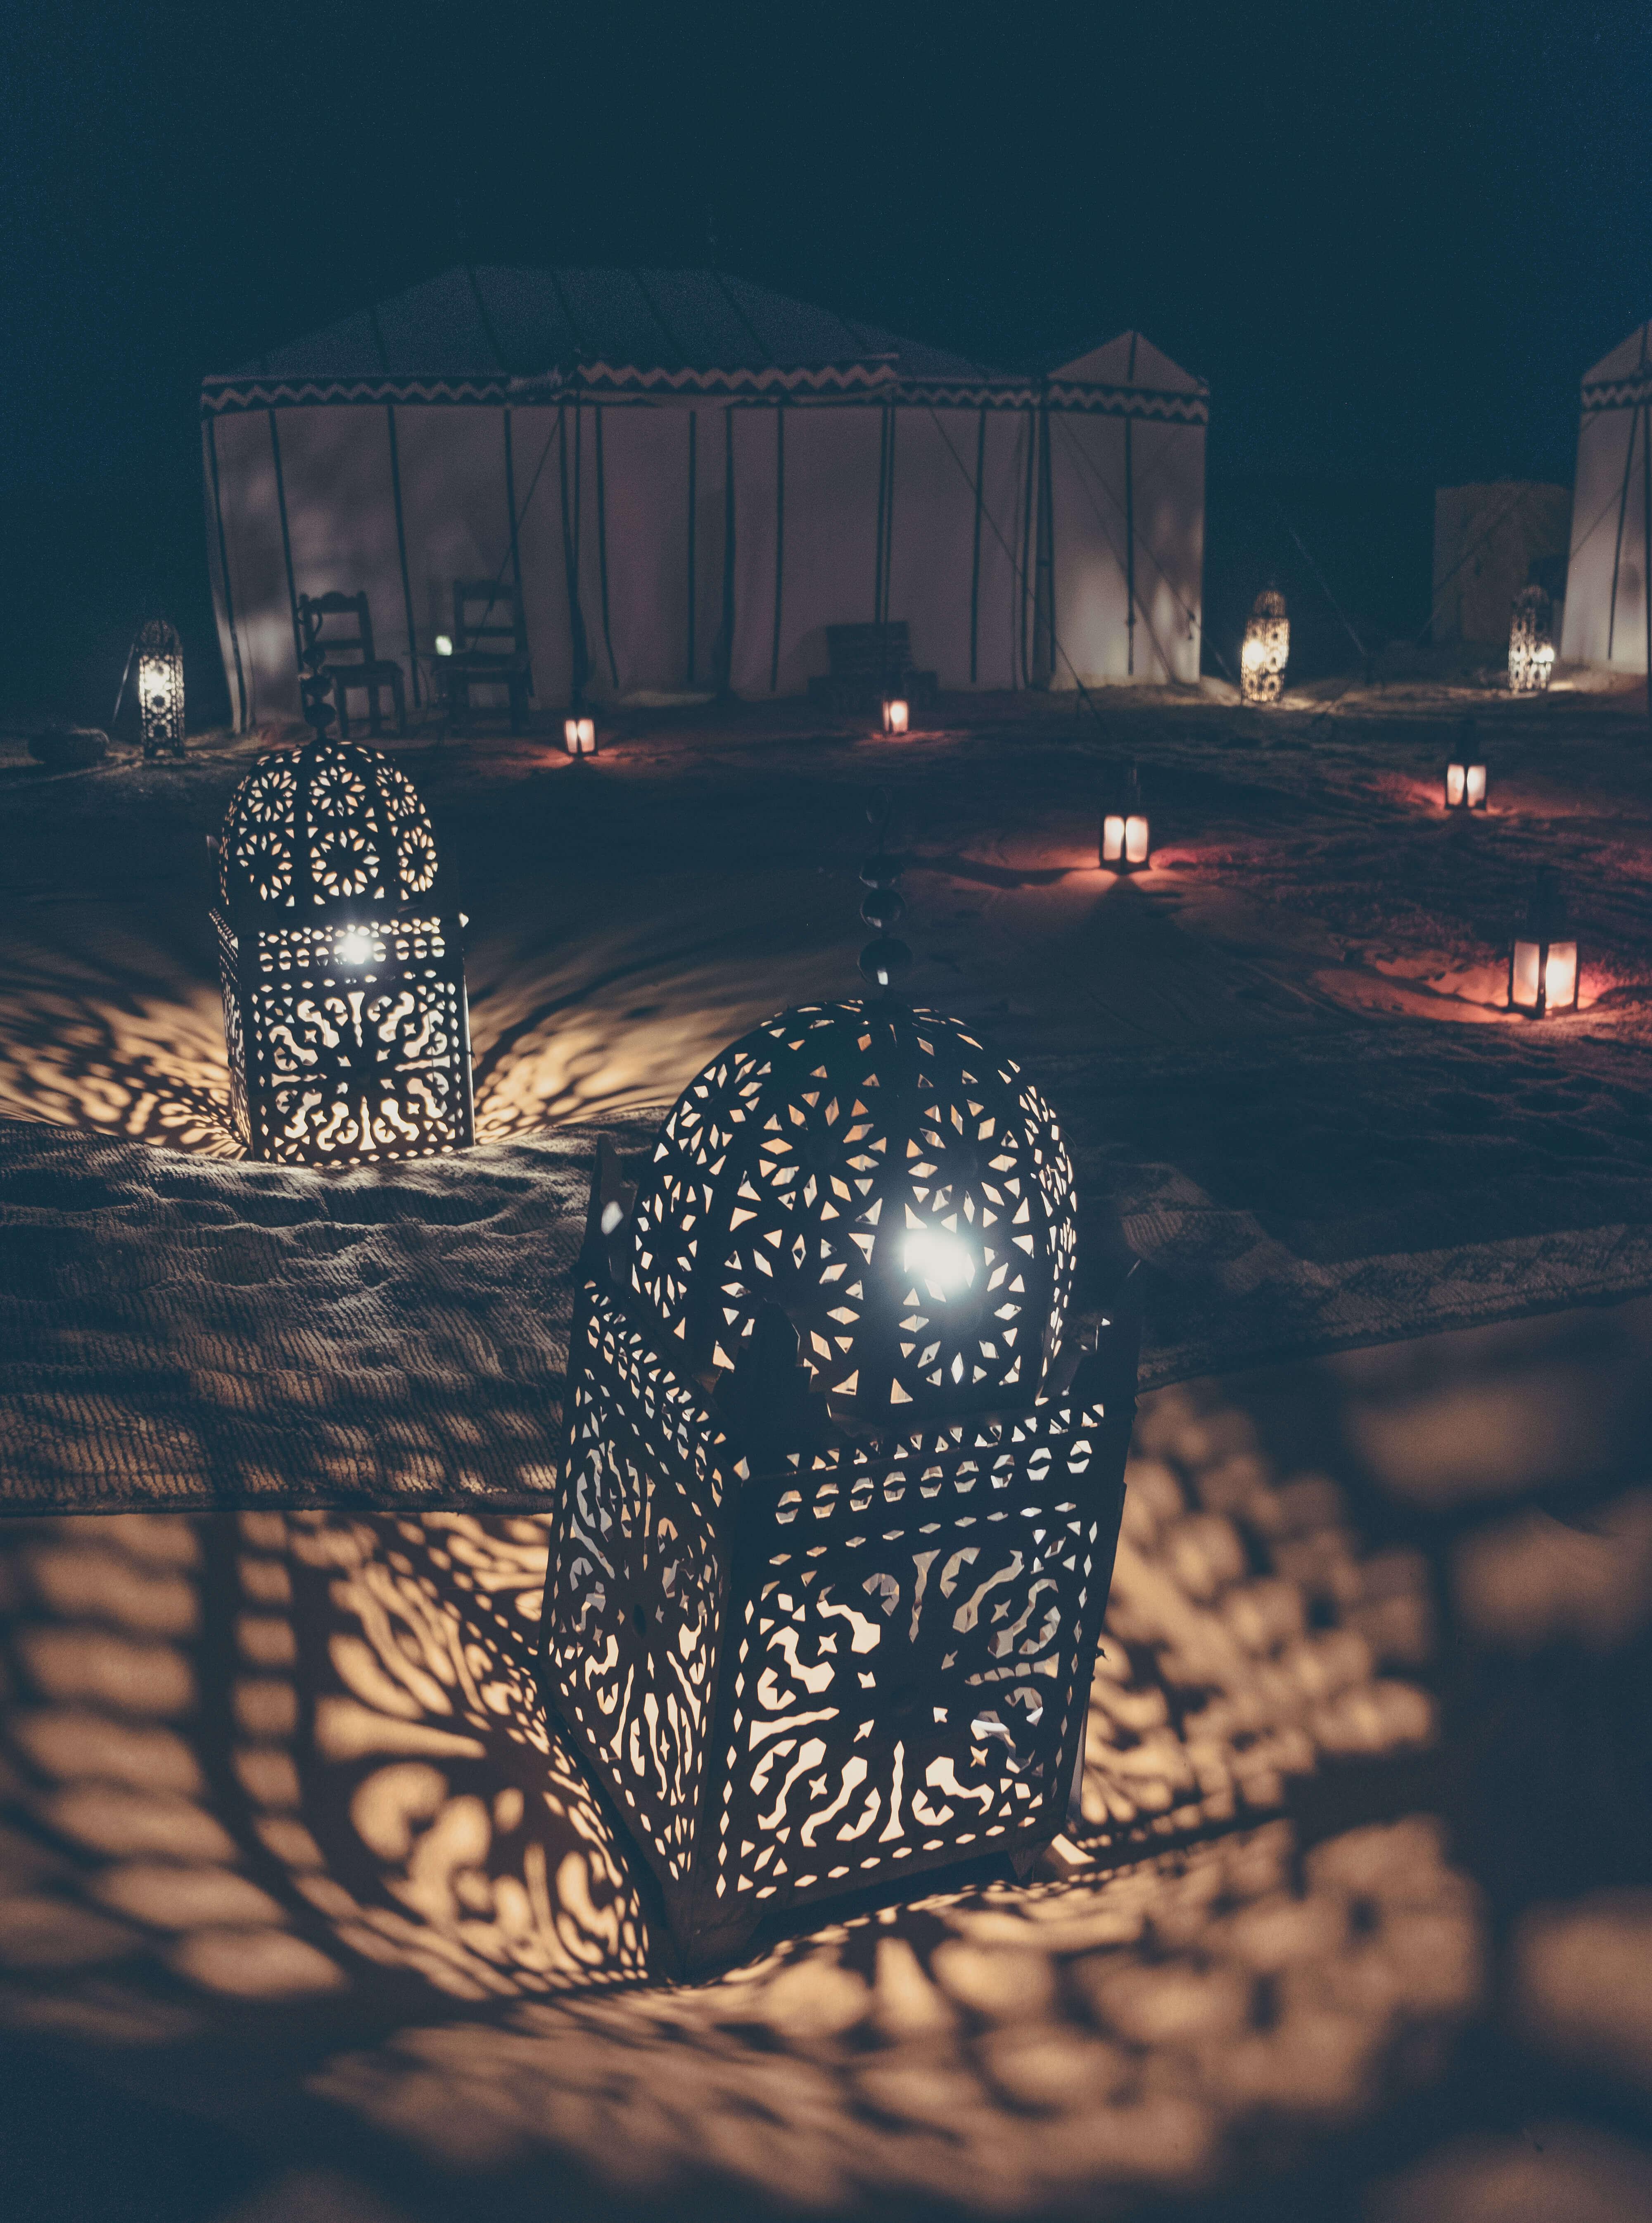 night details at luxury desert camp